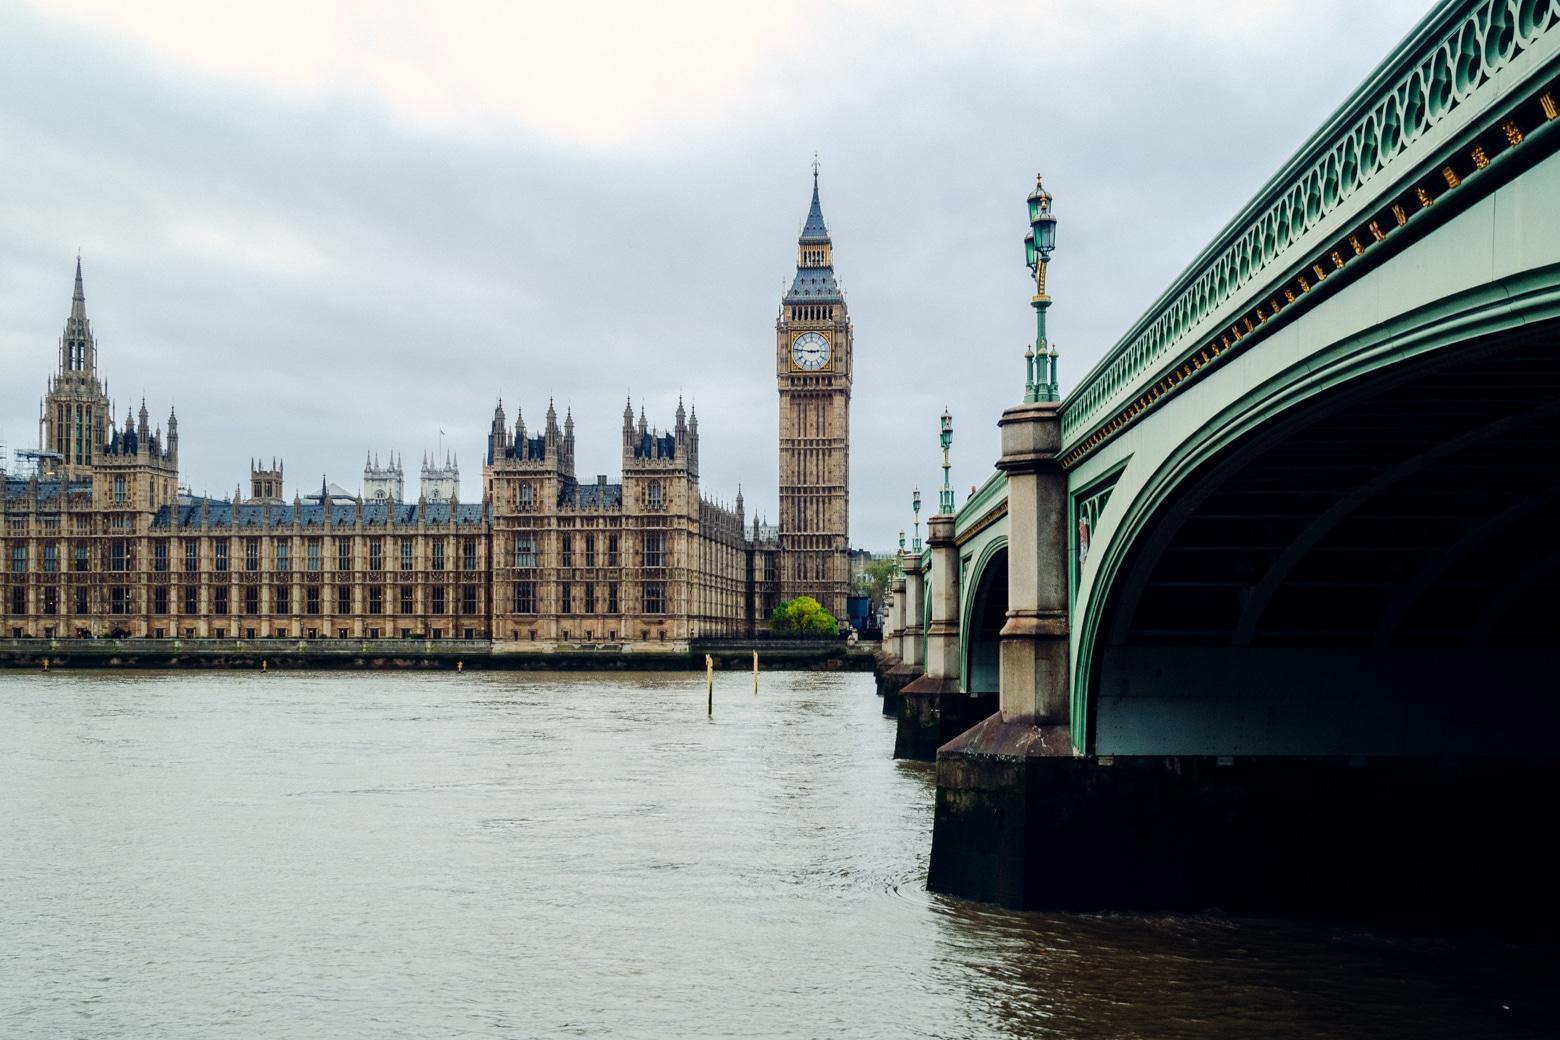 British Parliament building and Westminster Bridge